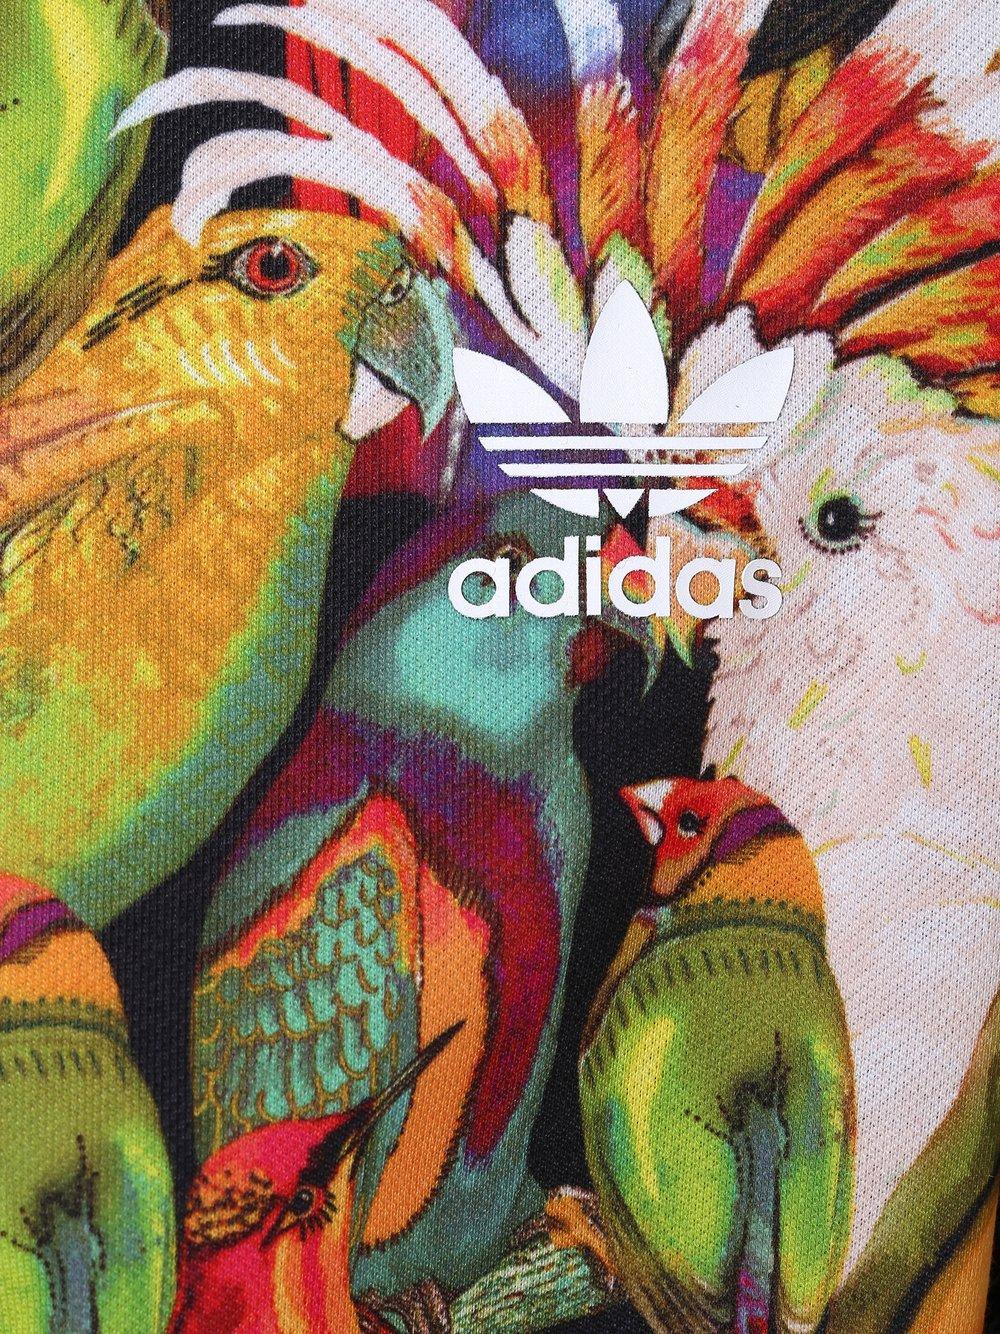 adidas Originals Damska bluza nierozpinana – Passaredo kup